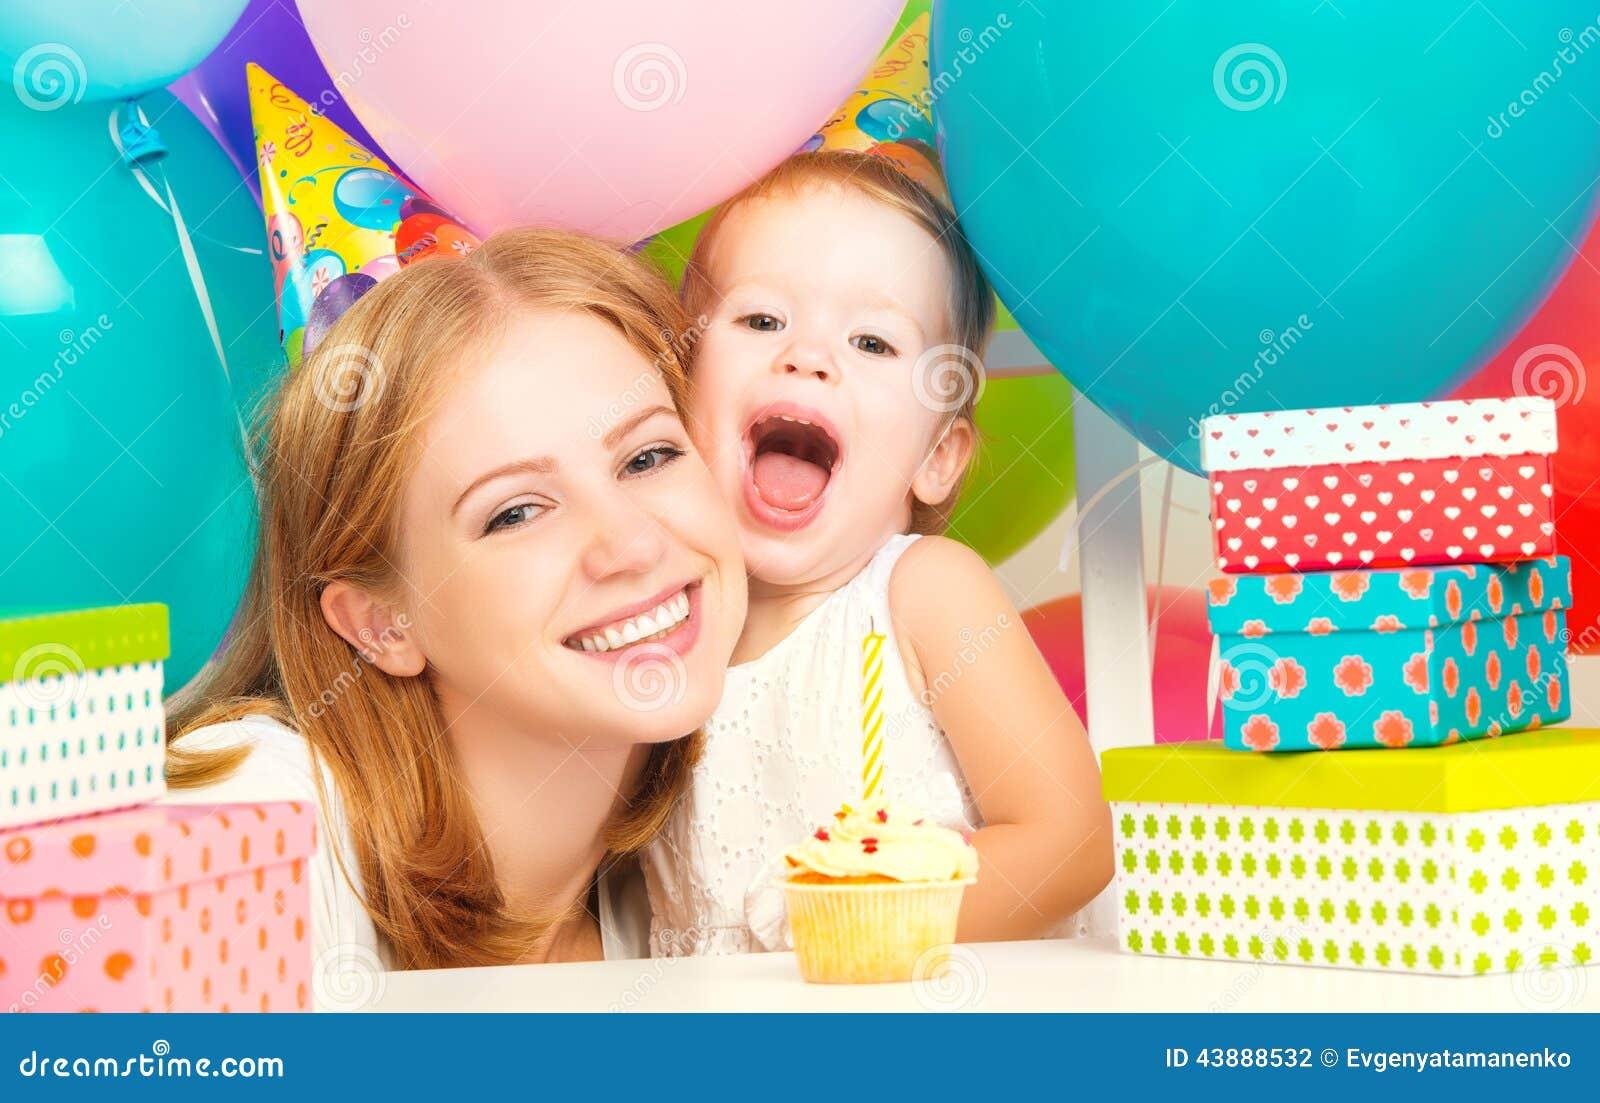 birthday mom daughter balloons cake gifts stock photo image